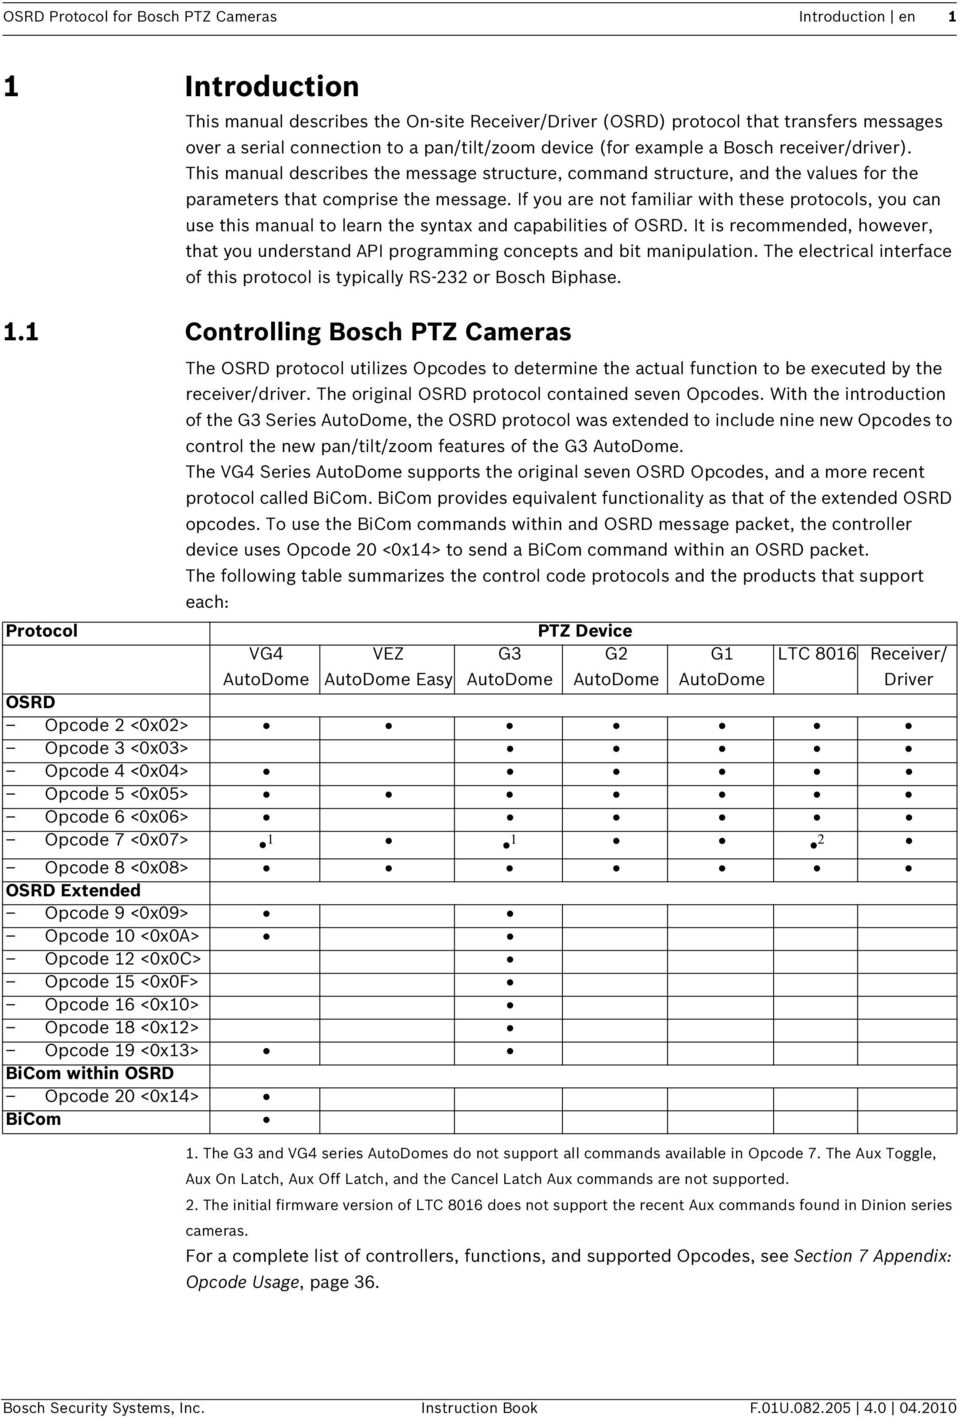 hight resolution of osrd protocol for bosch ptz cameras receiver drivers g1 g2 g3 autodome ptz camera wiring diagram